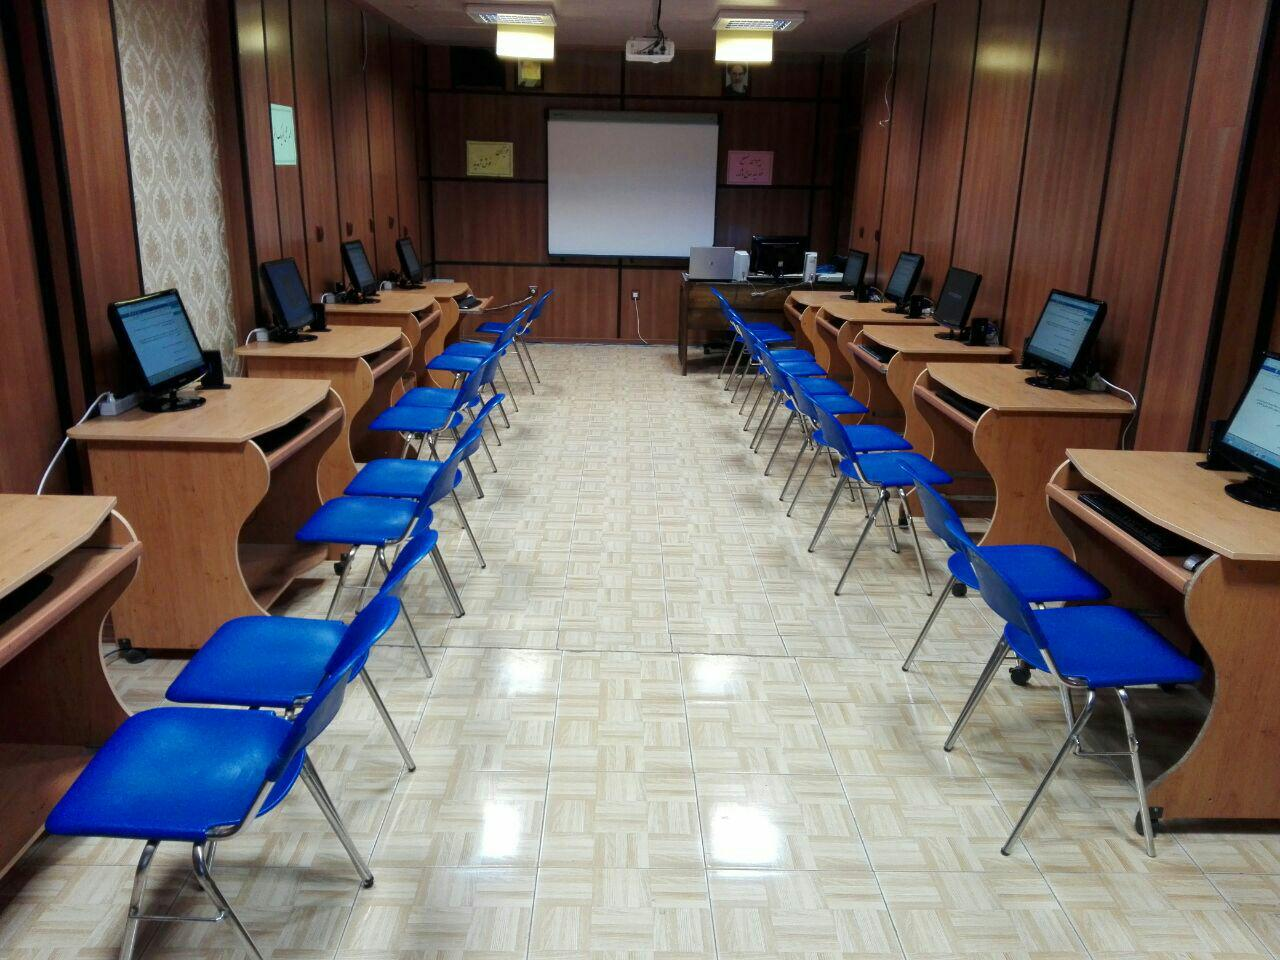 Toseye-School-in-Iran3.jpg